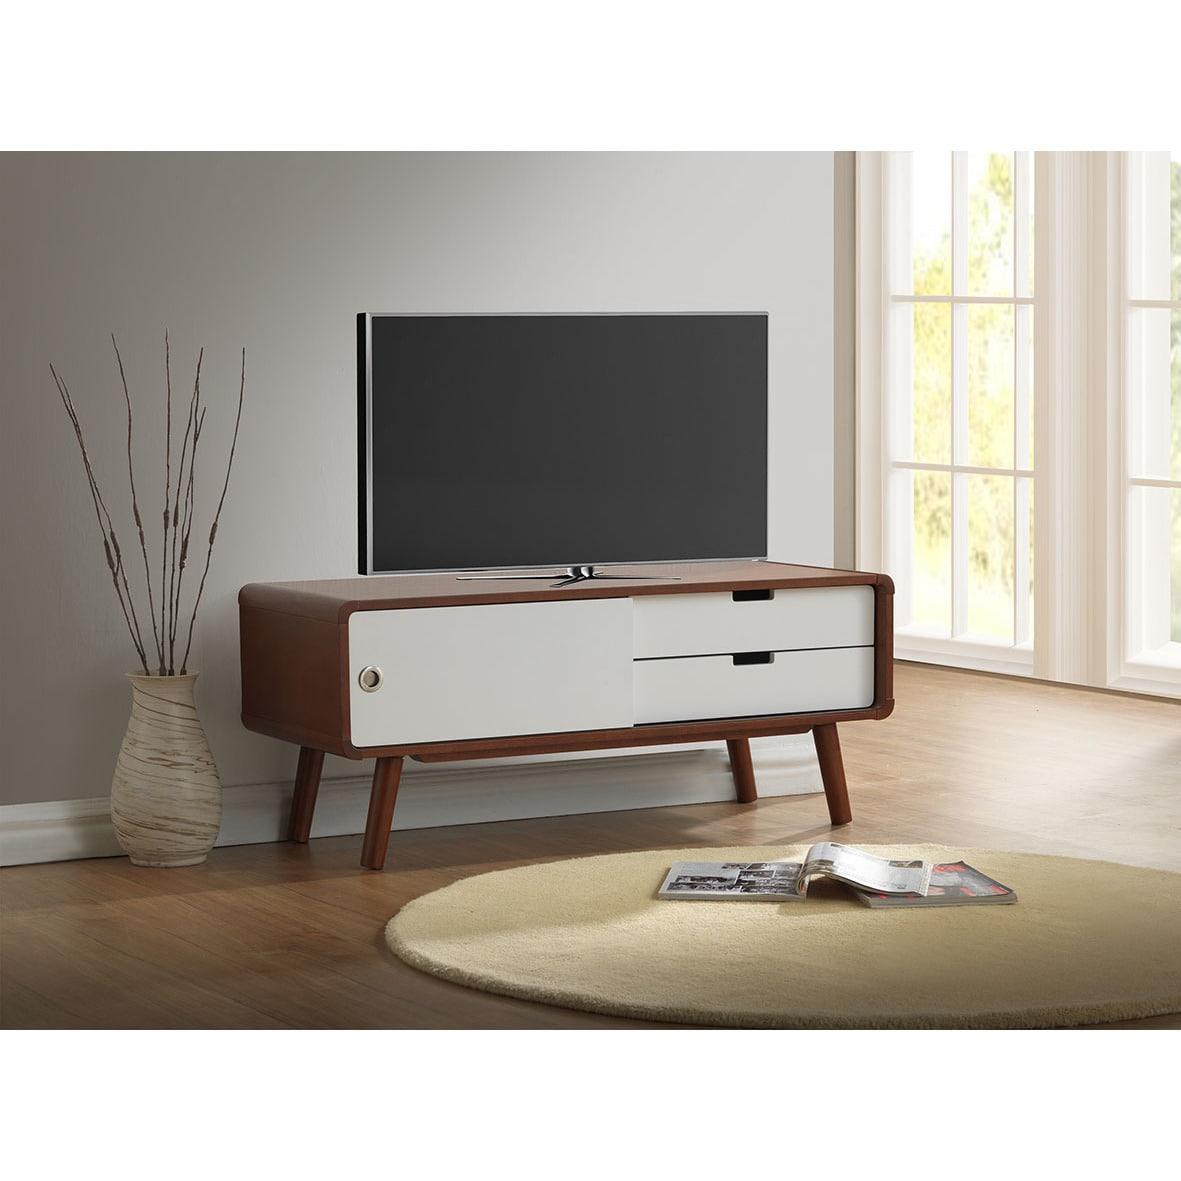 Baxton Studio Armani Mid Century Dark Walnut And White Tv Stand  # Meubles De Television En Bois